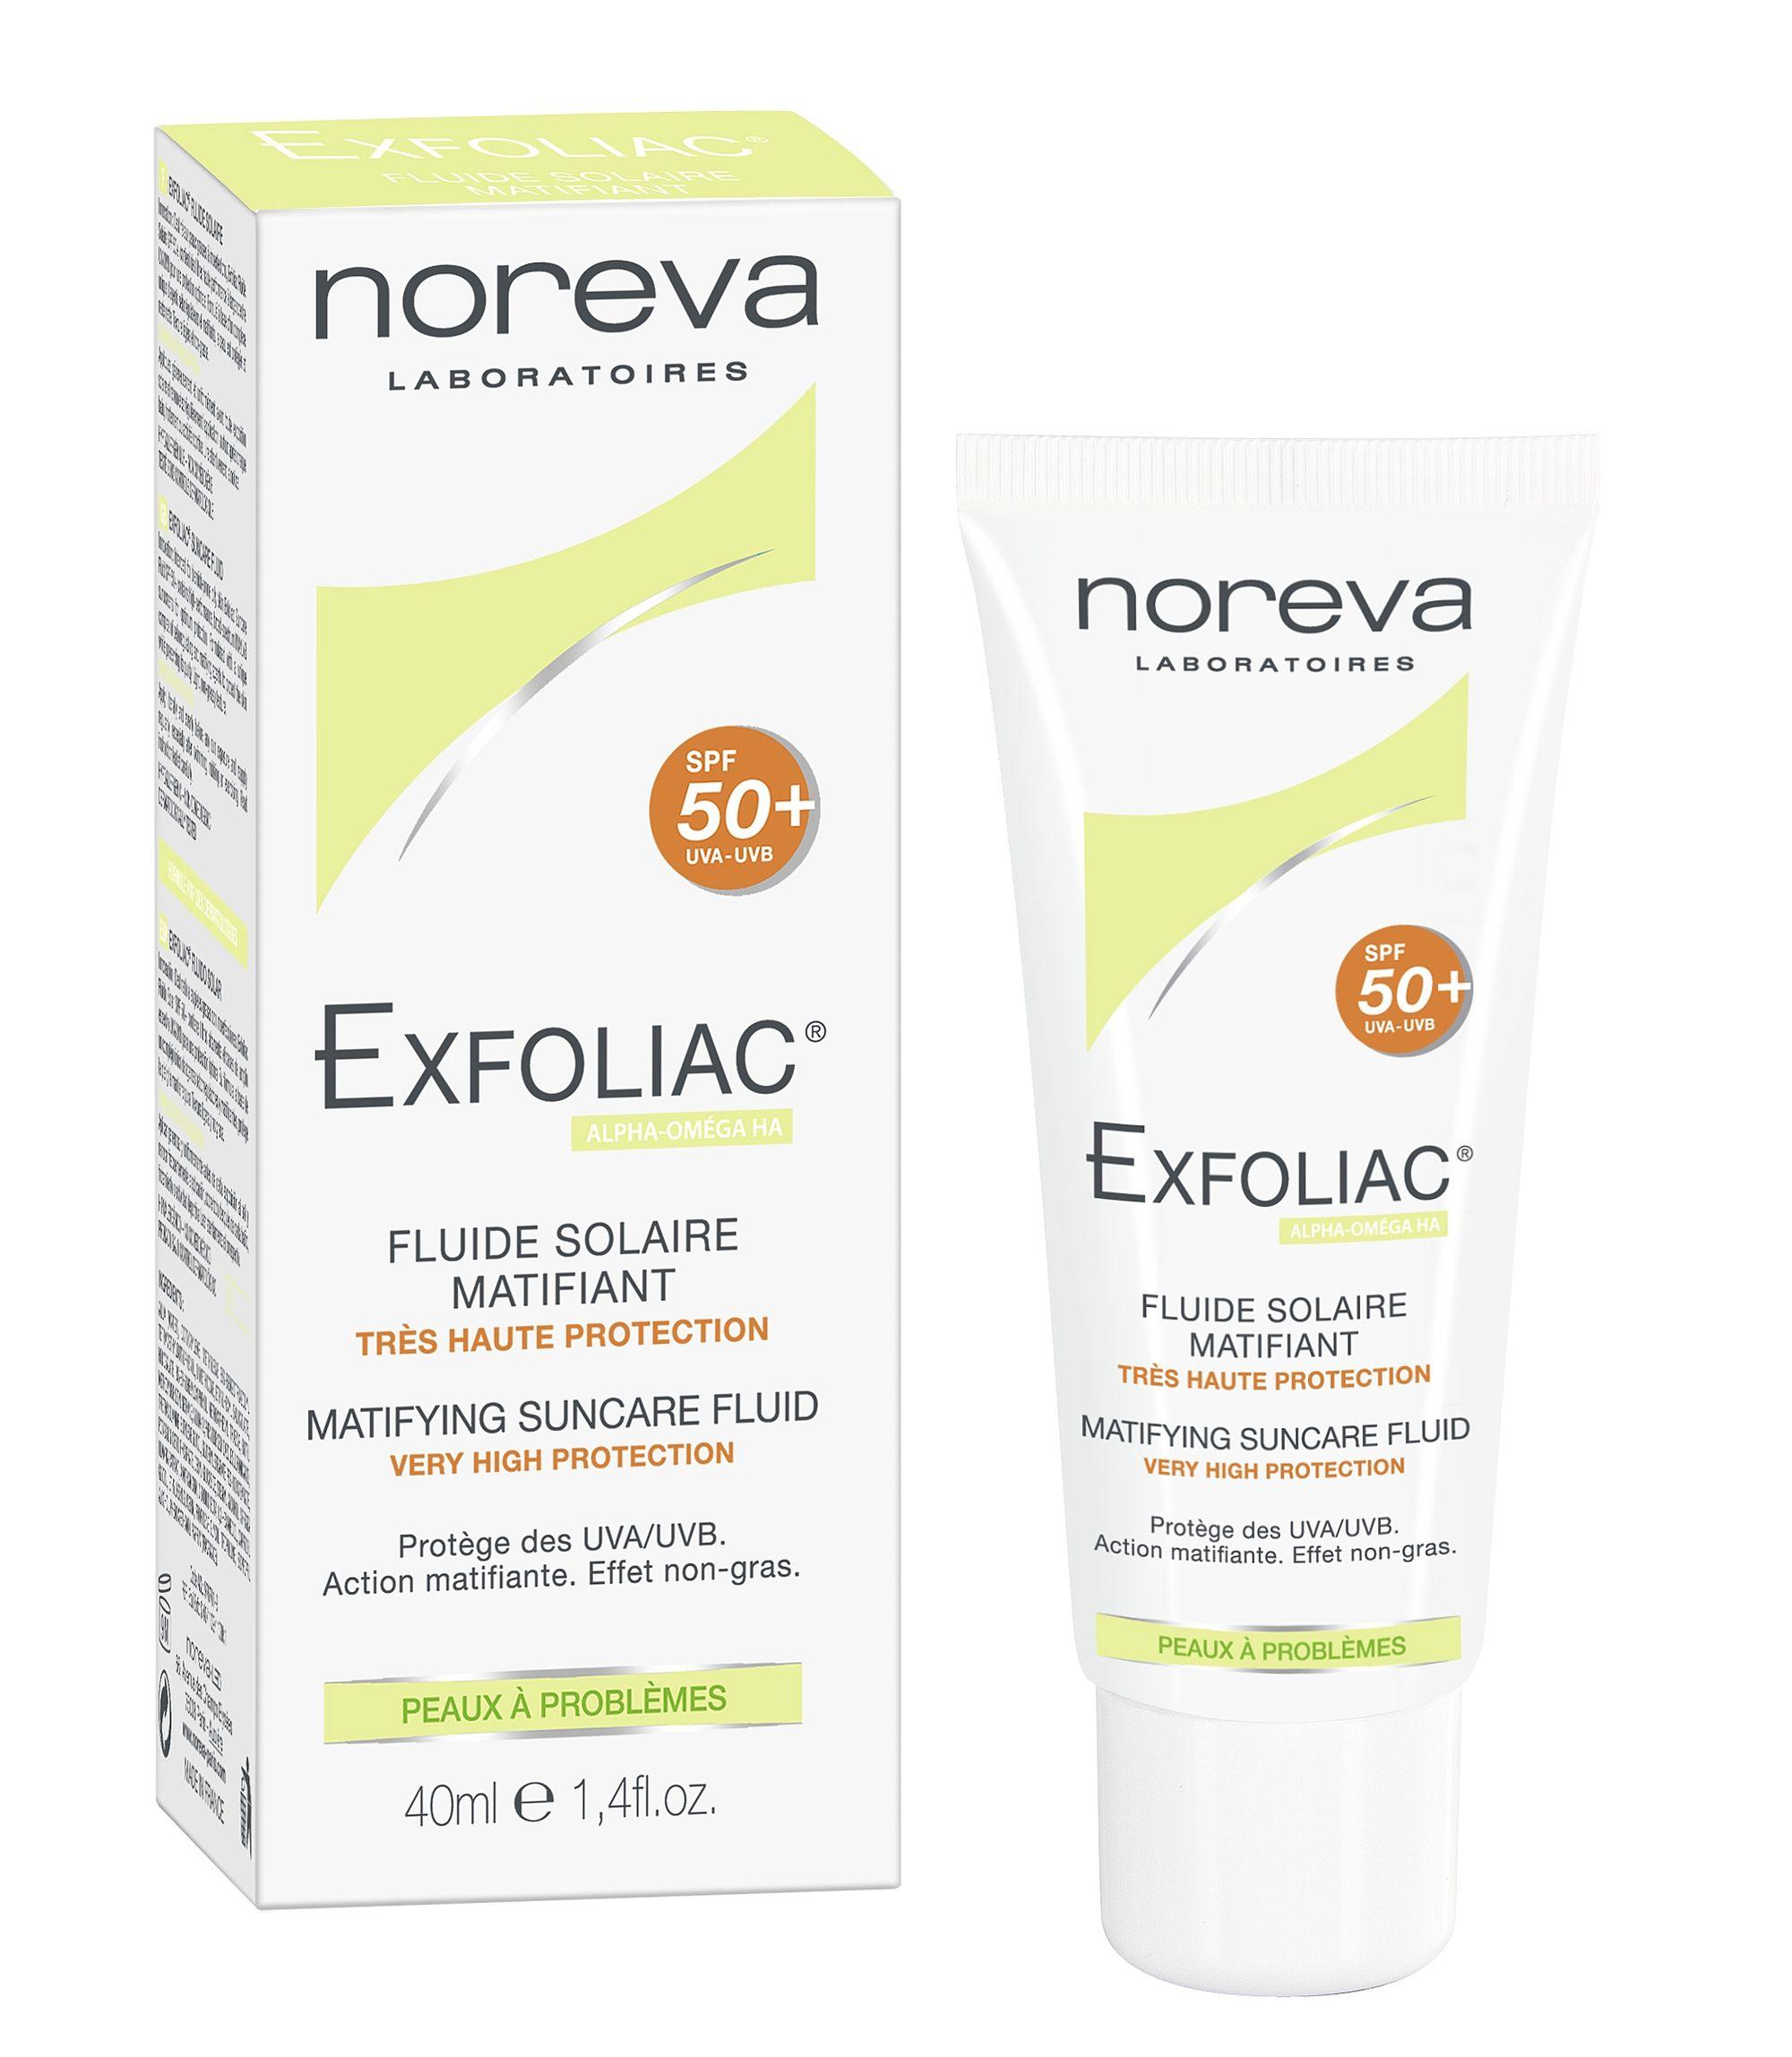 Noreva Exfoliac Матирующая солнцезащитная эмульсия SPF50+, эмульсия, 40 мл, 1 шт.